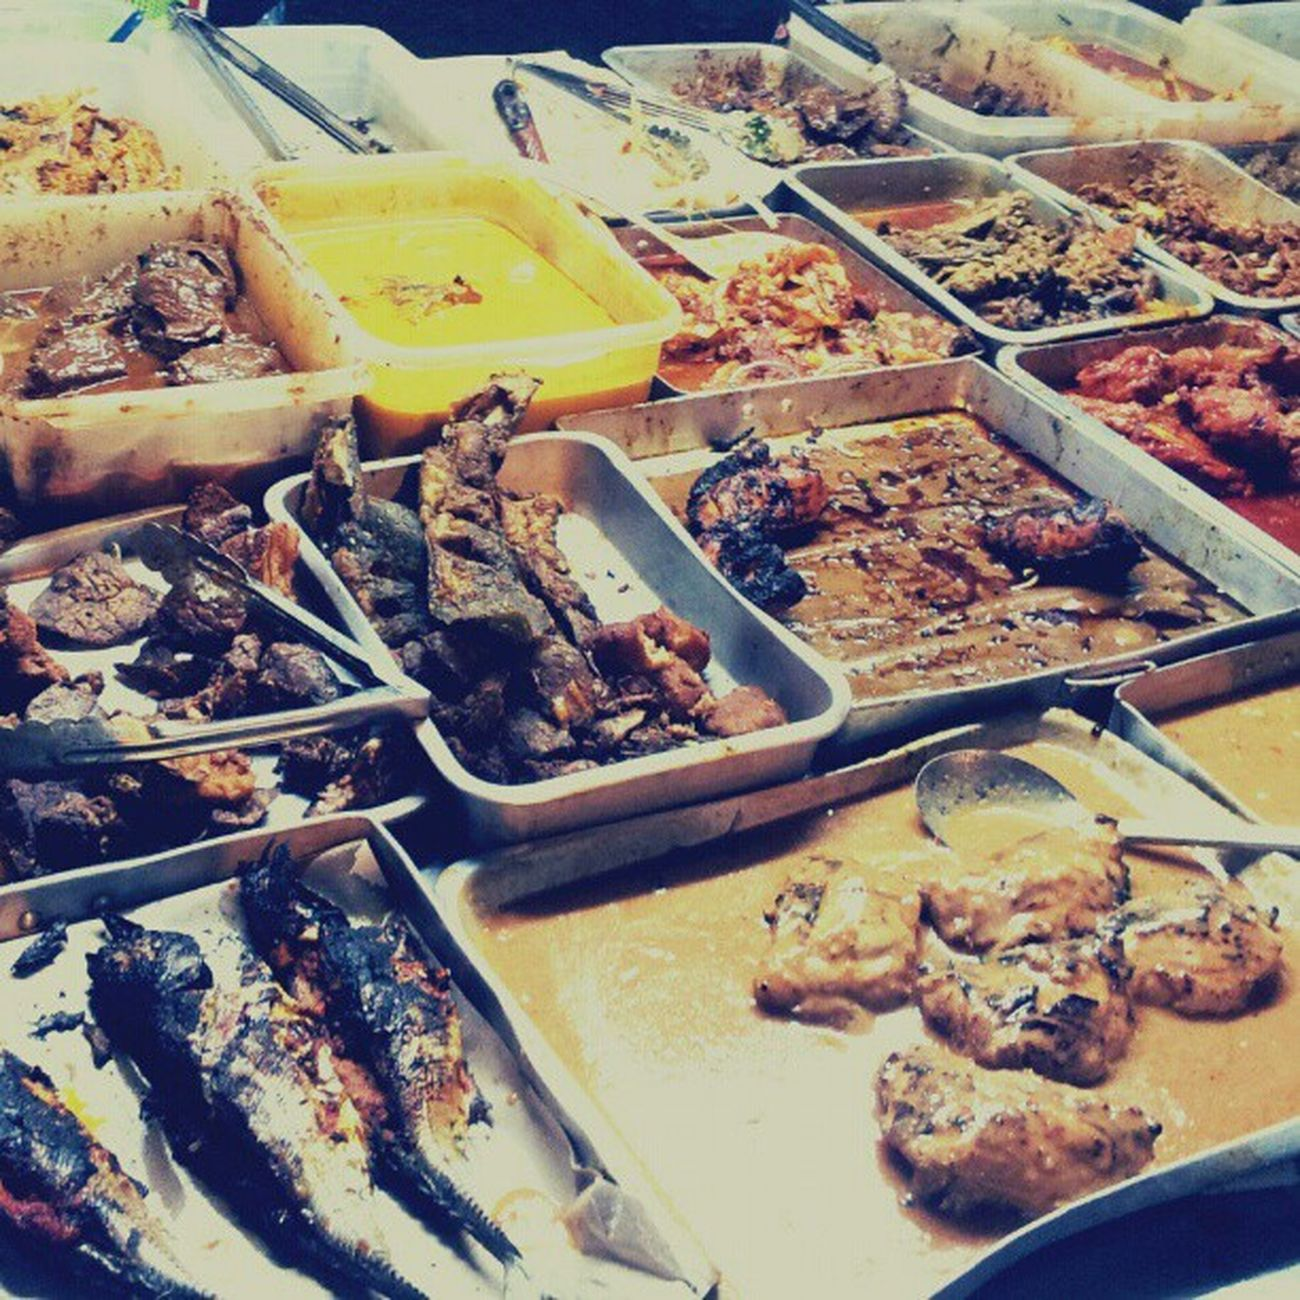 Lauk pauk Menu Saji Kelantan Jalanjalancarimakan ikan malaysia